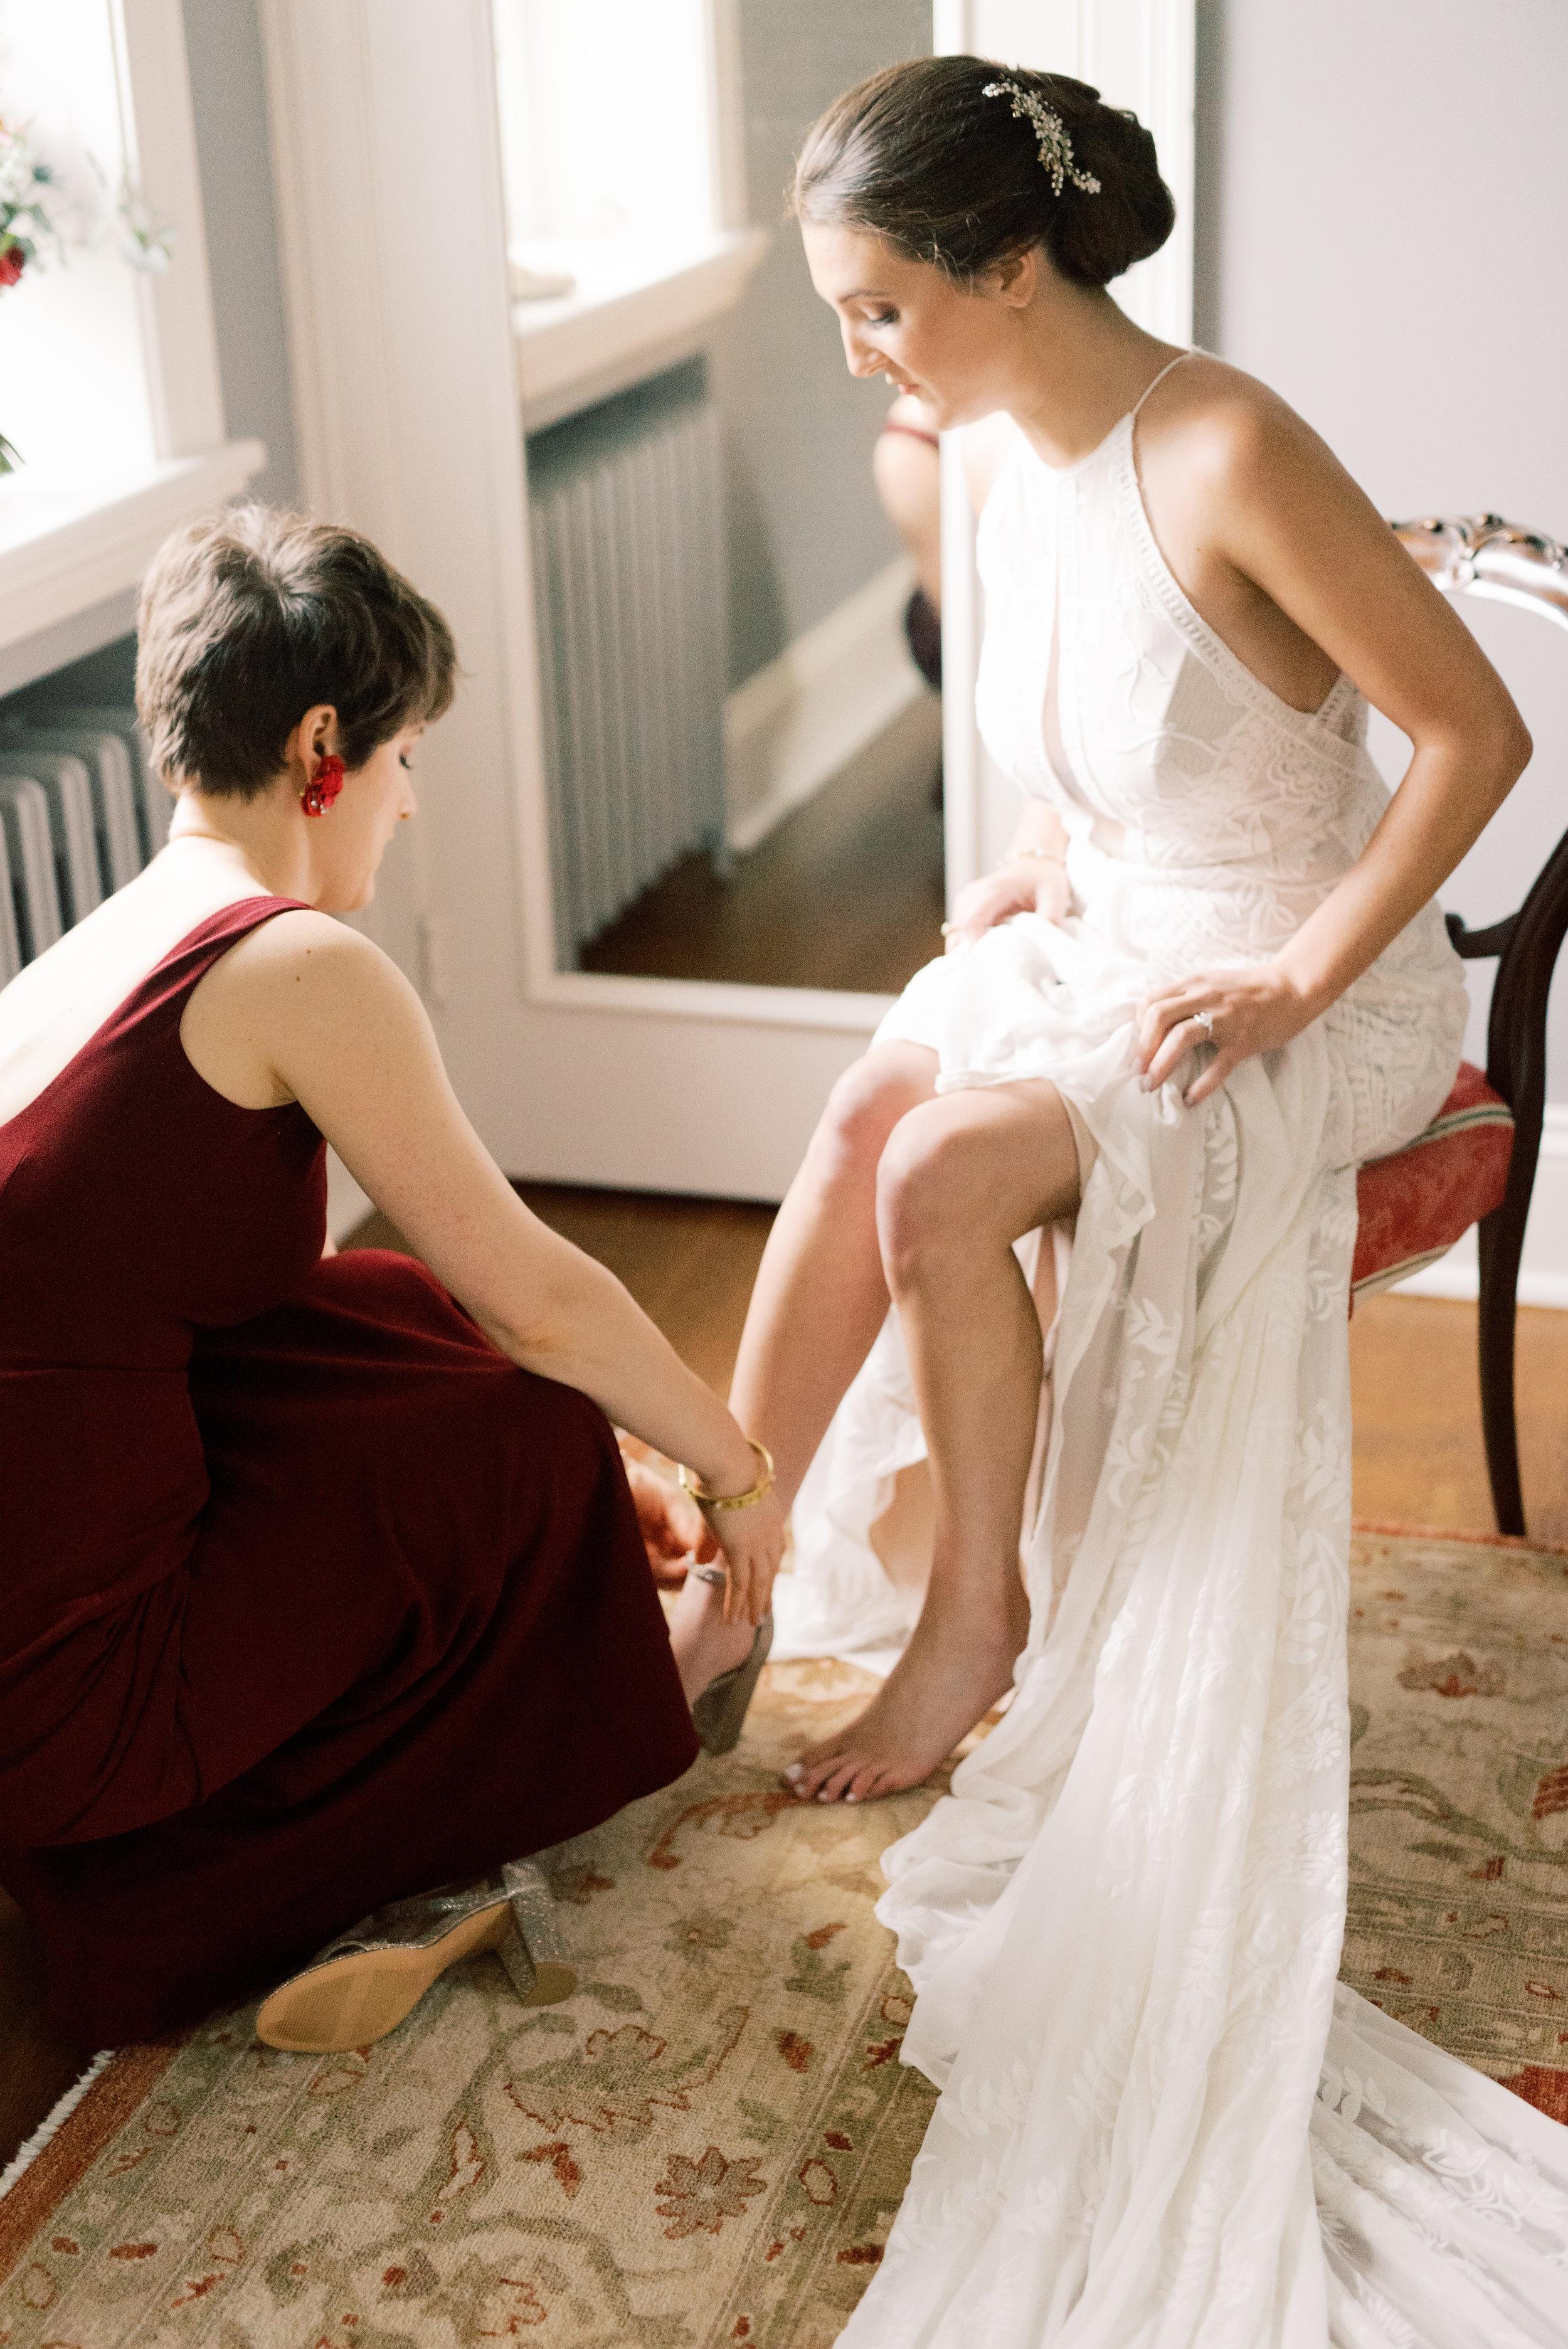 haley-richter-photography-october-pomme-wedding-in-radnor-018.jpg